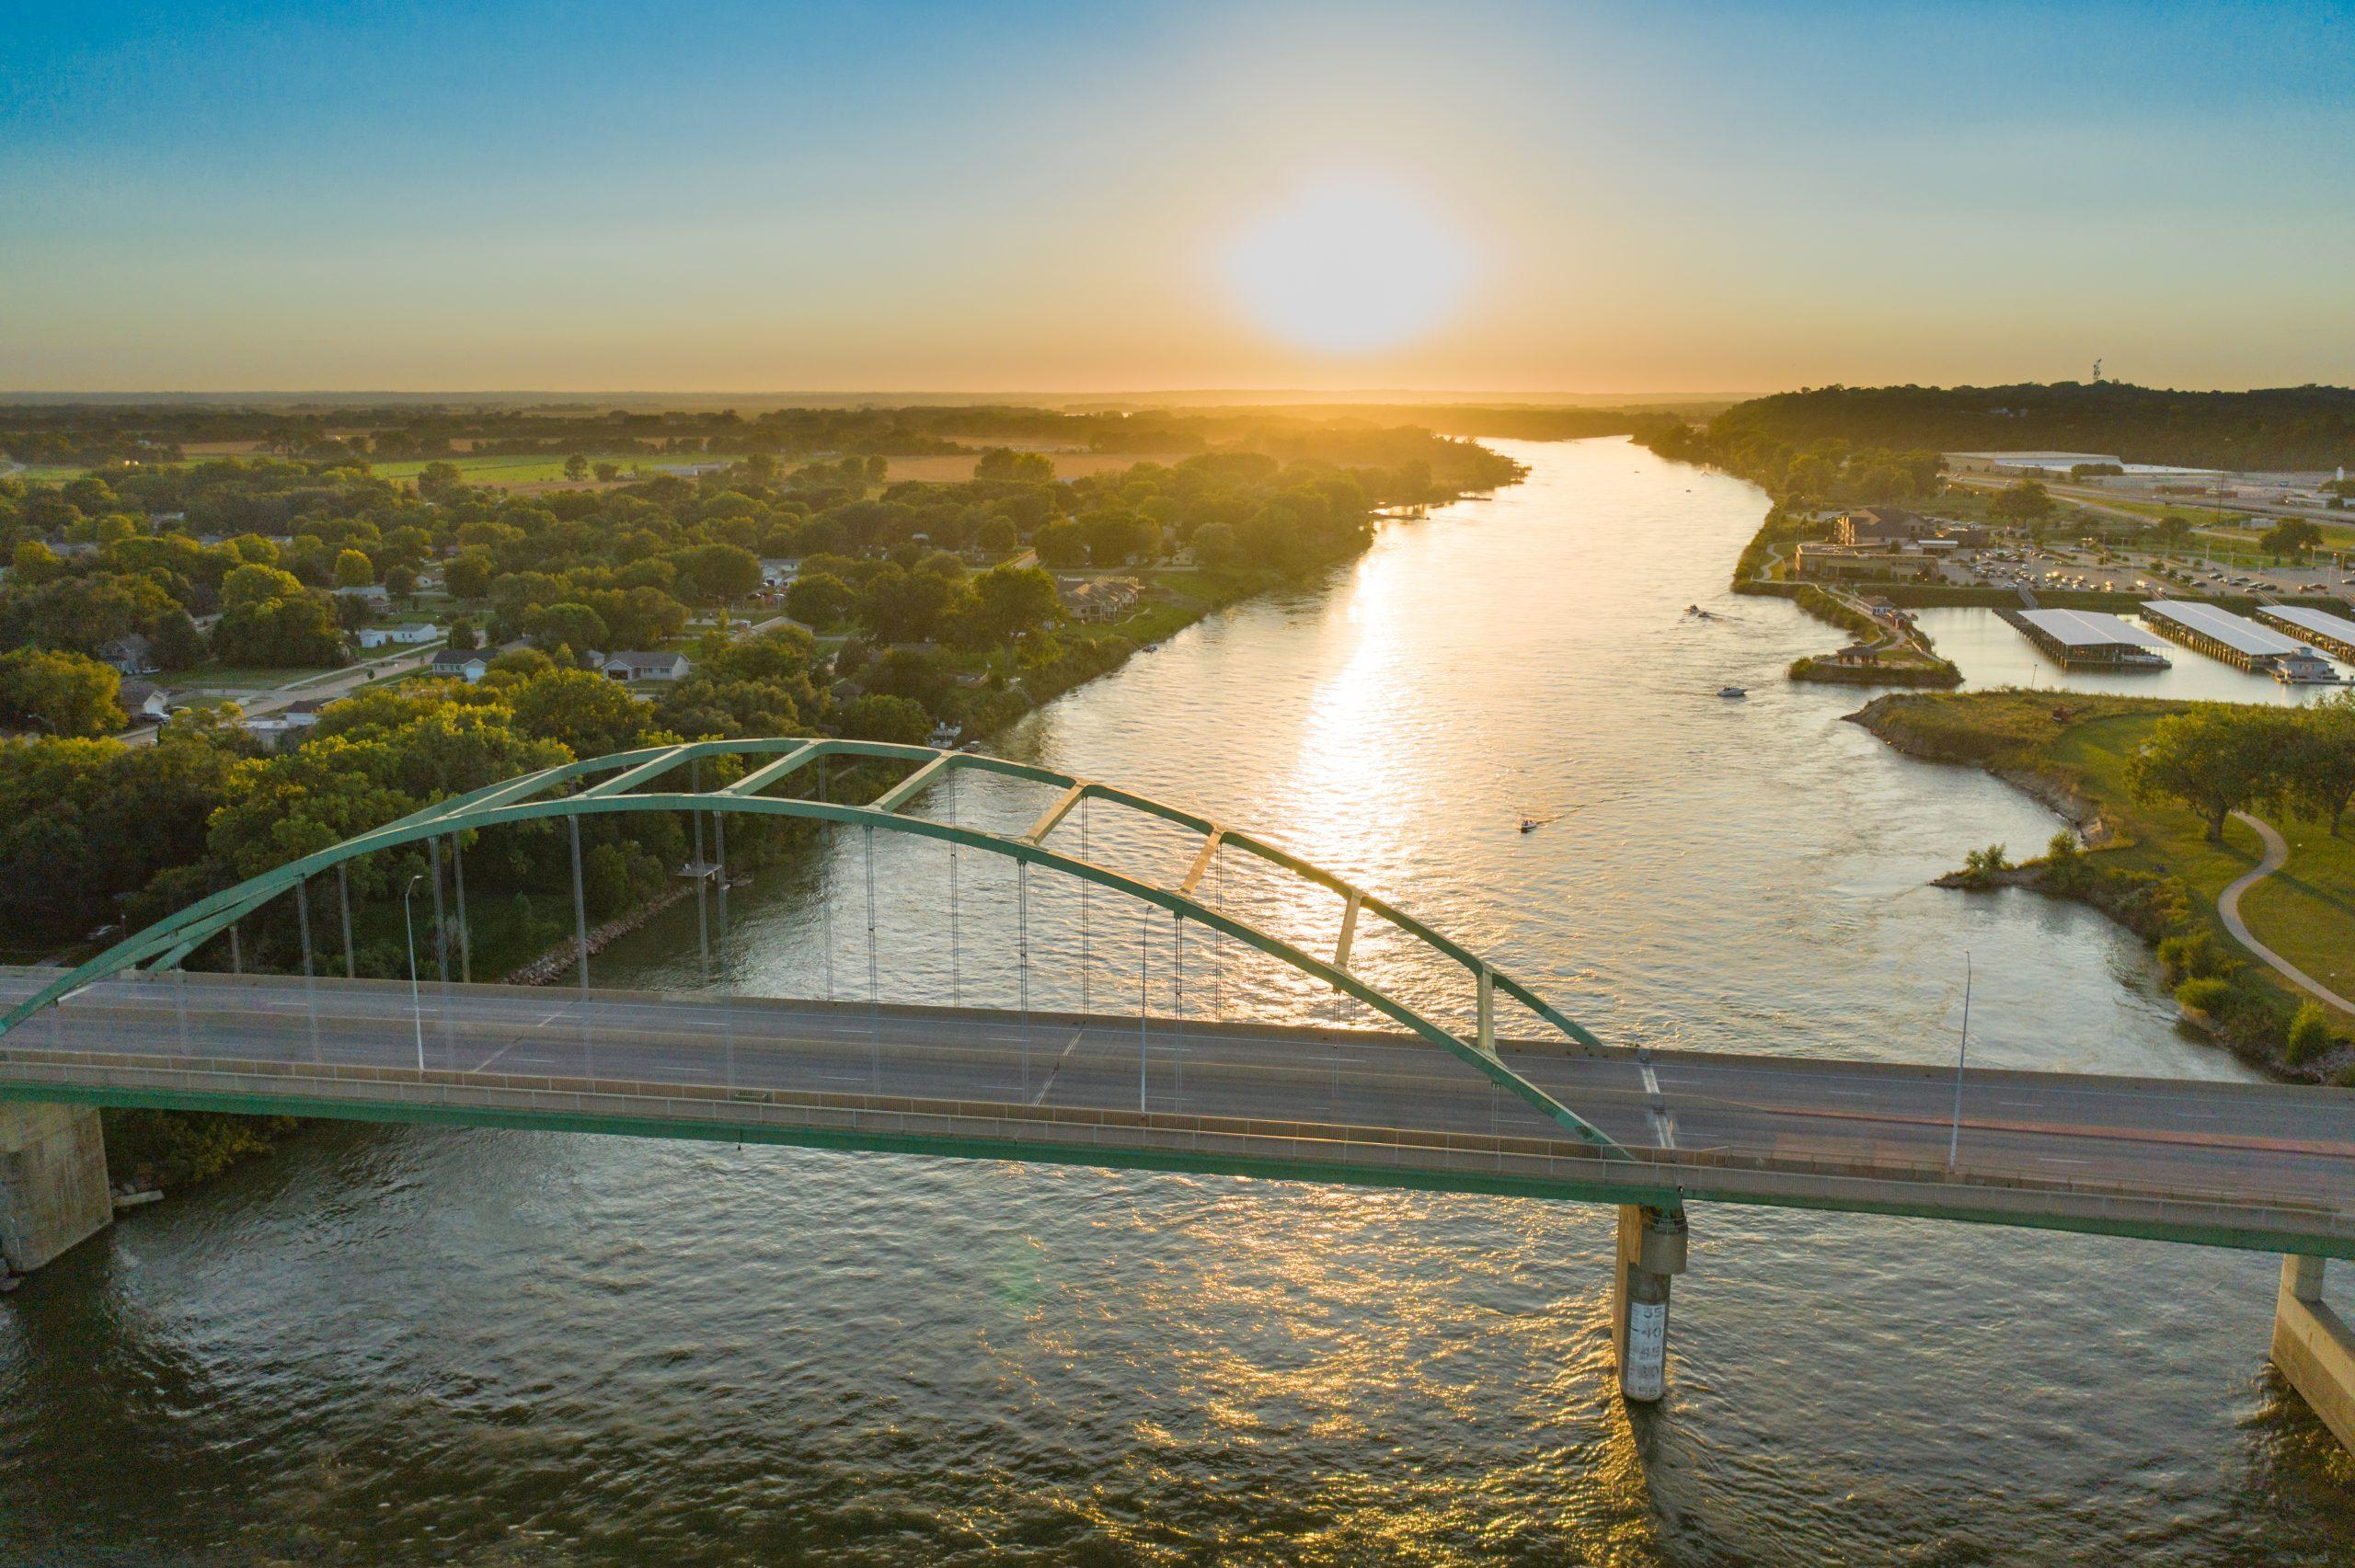 Sunset over Veteran's Memorial Bridge in Sioux City, Iowa, over the Missouri River.